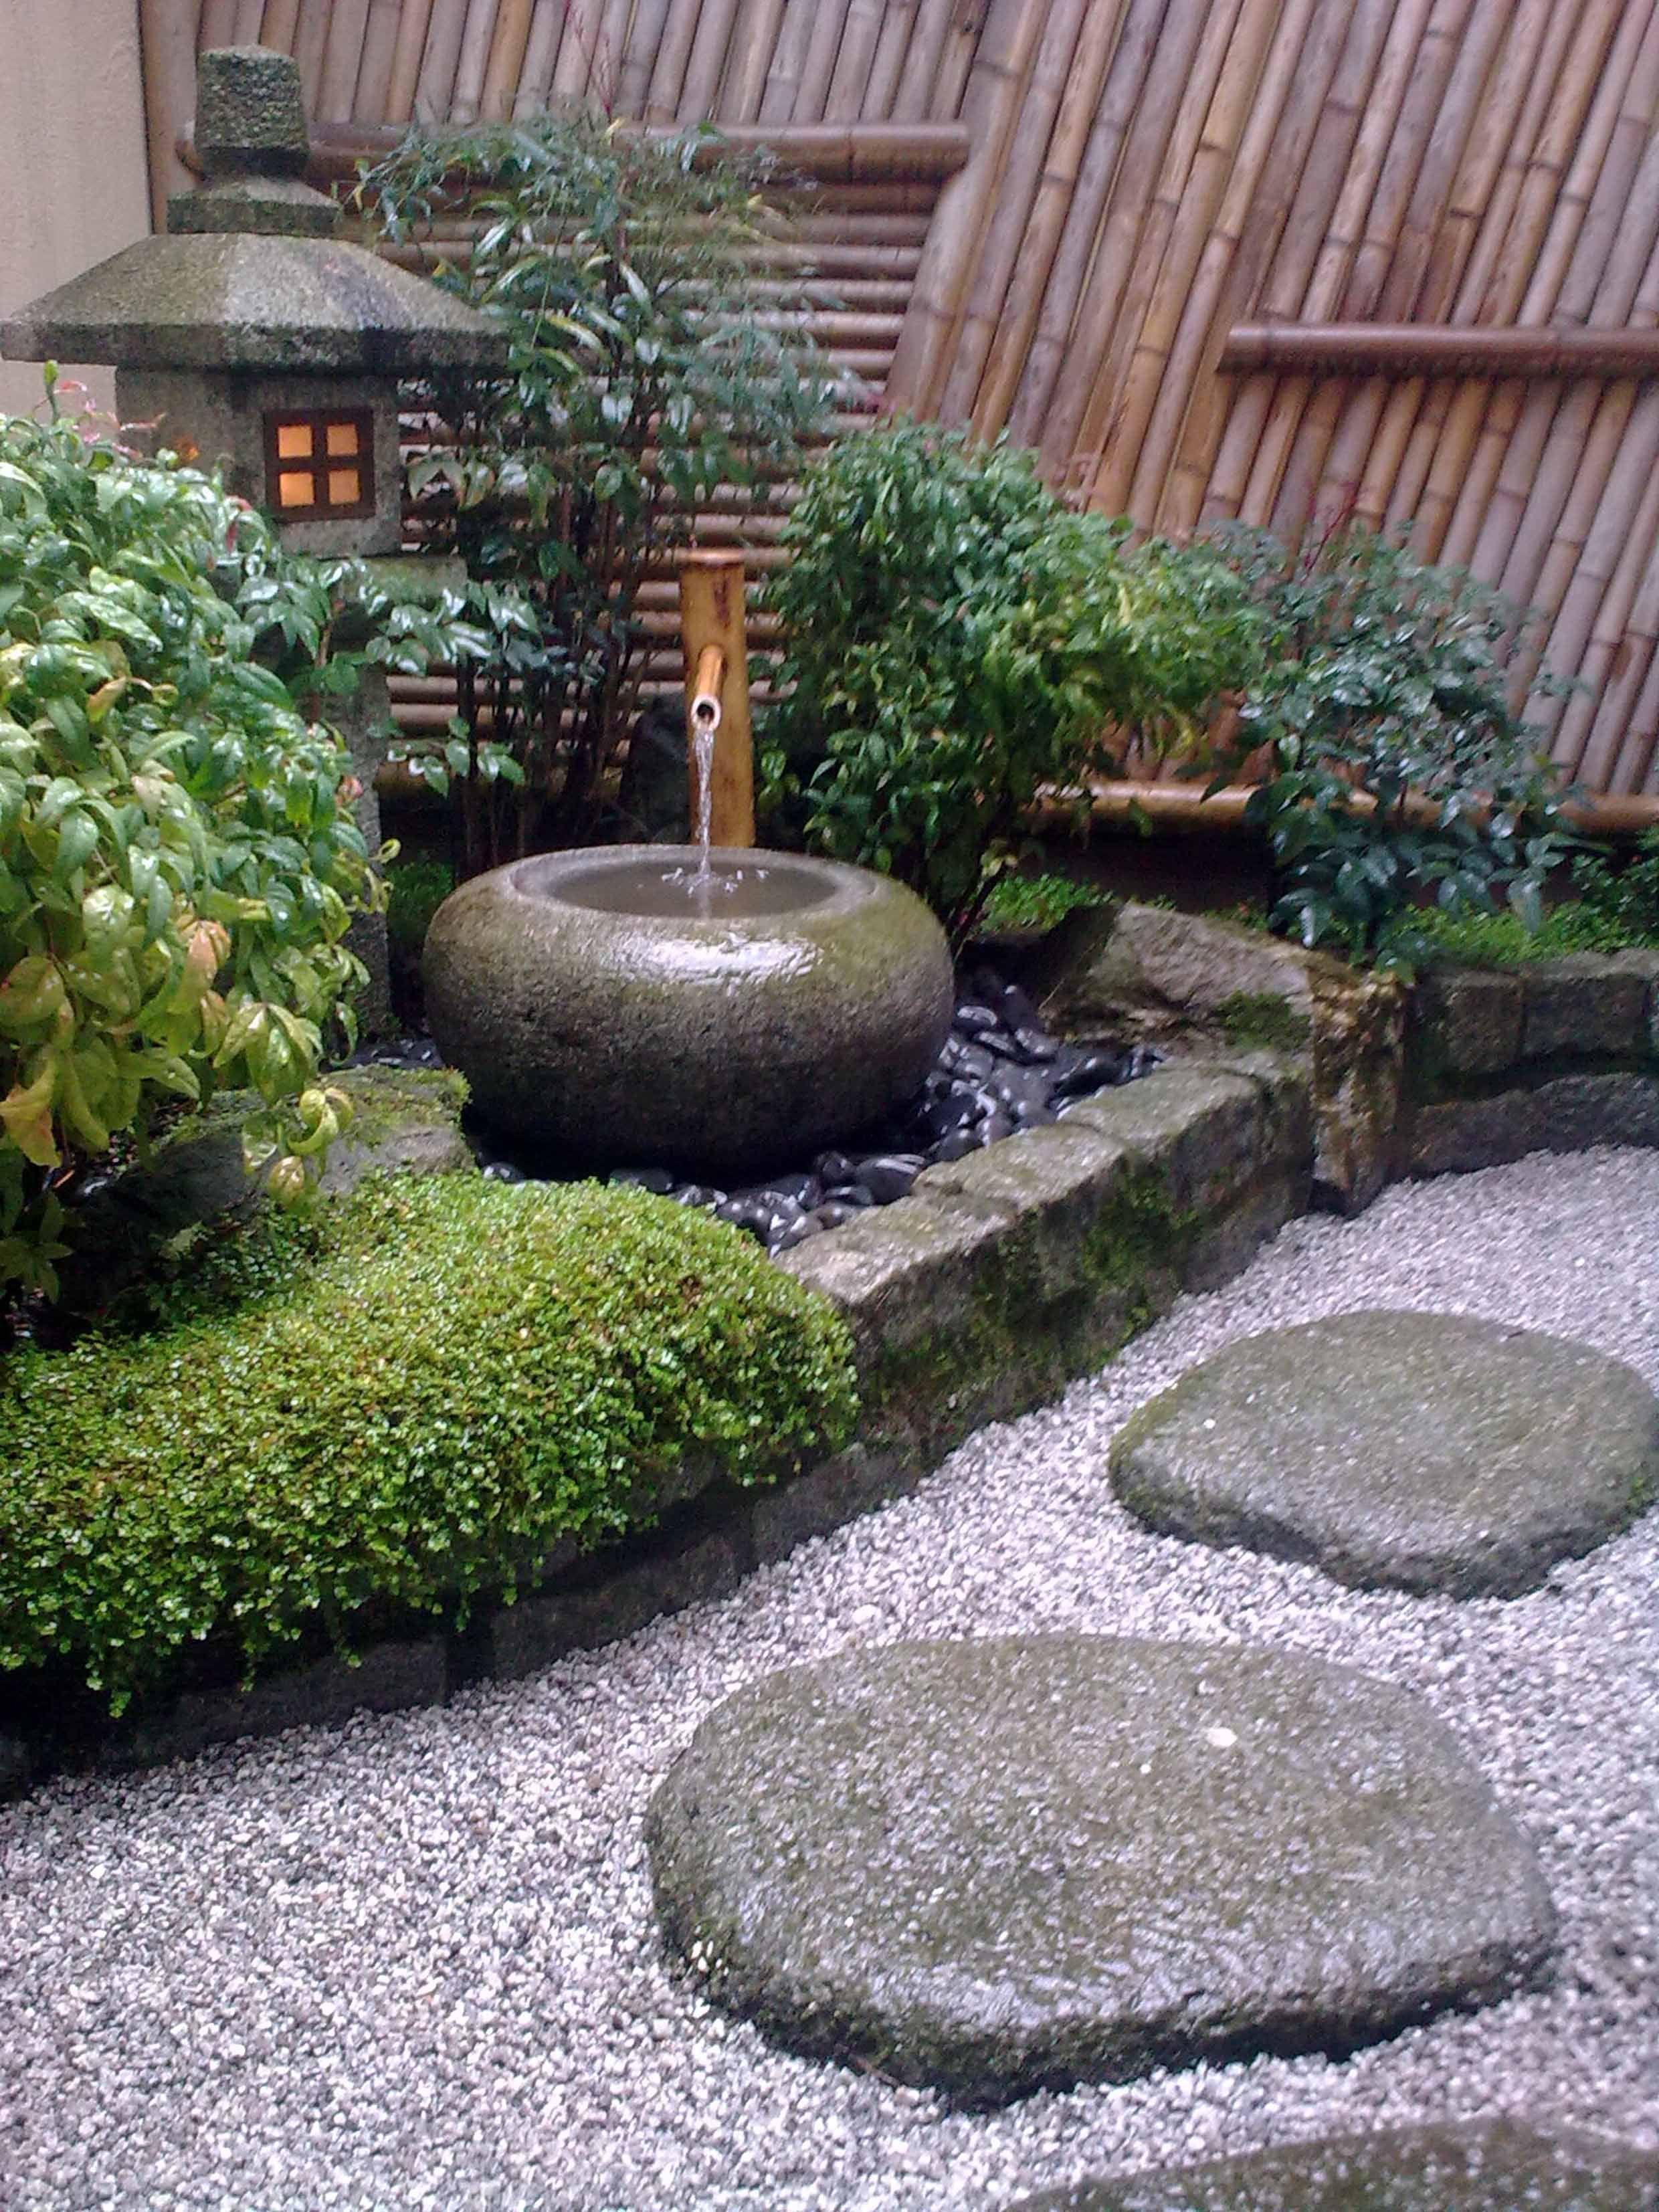 10 Small Zen Garden Ideas Most Of The Stylish As Well As Beautiful Small Japanese Garden Courtyard Gardens Design Zen Garden Design